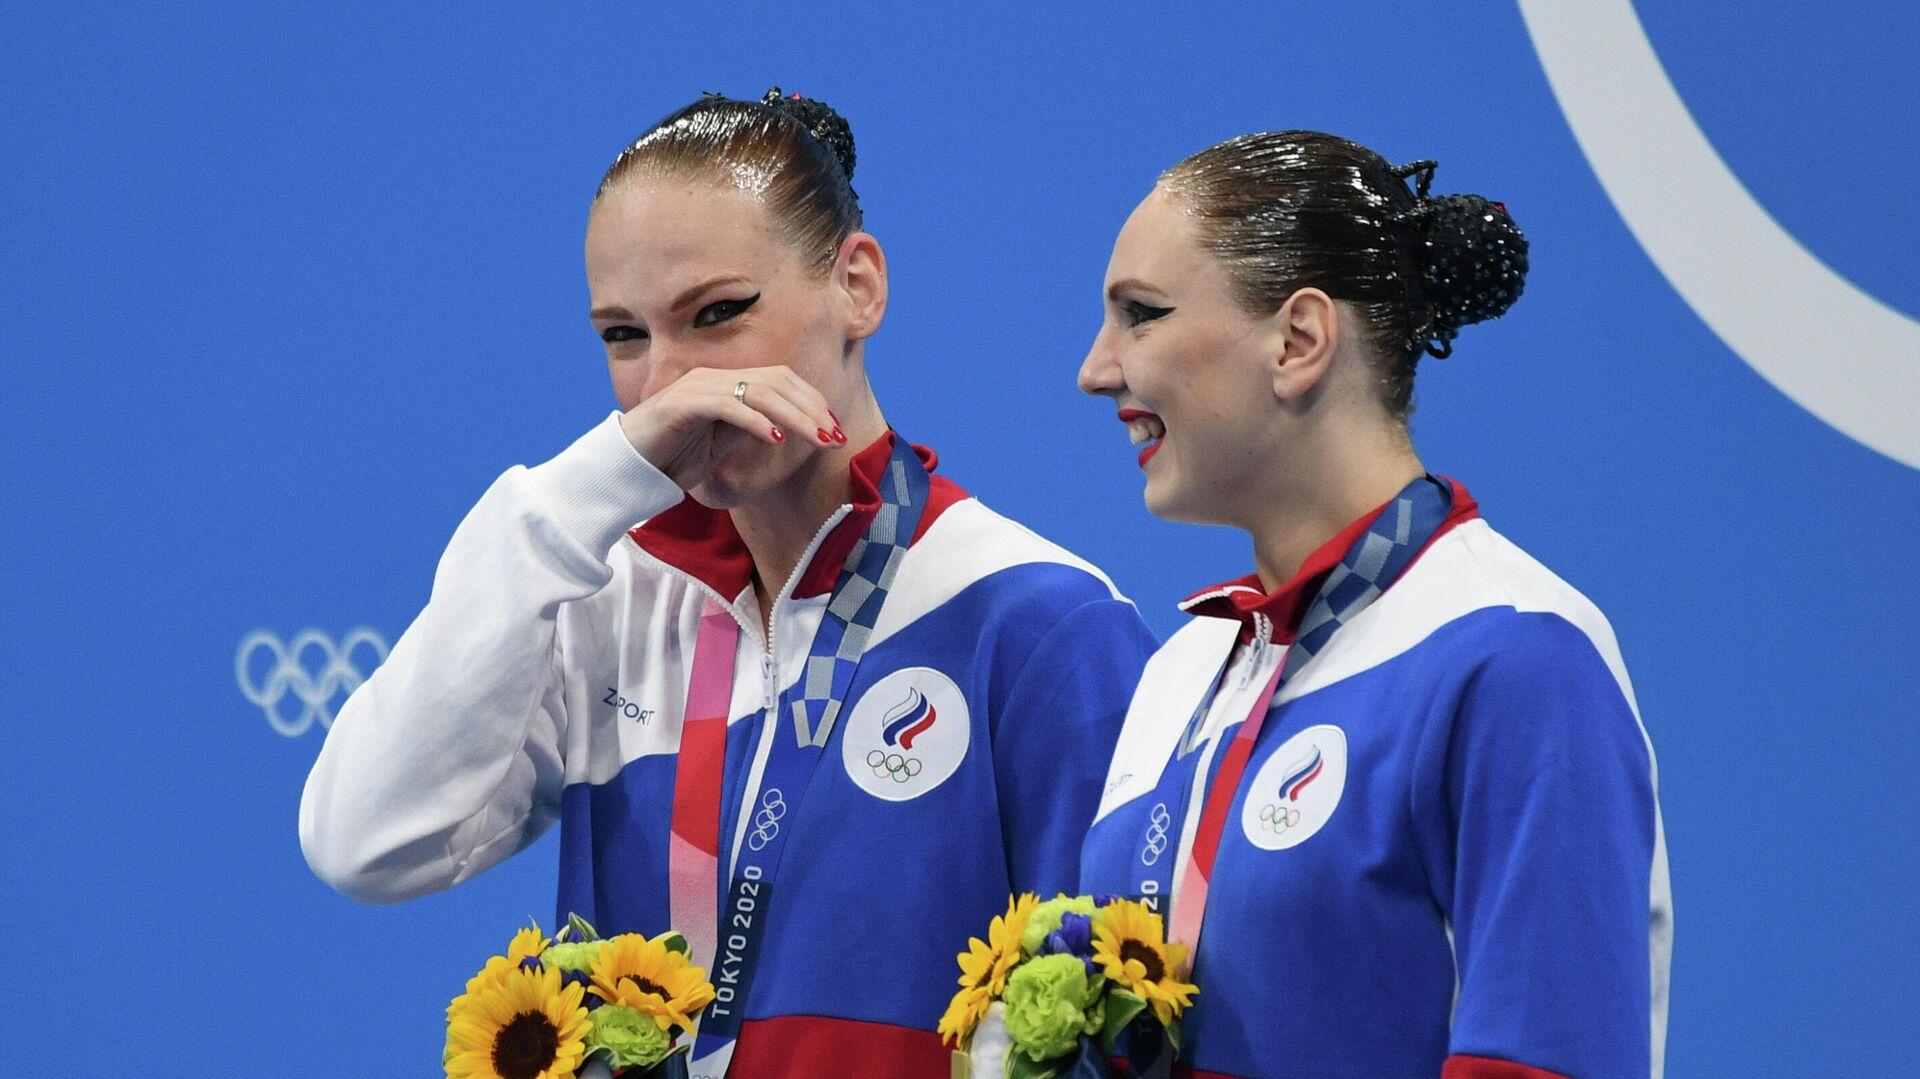 Светлана Колесниченко и Светлана Ромашина - РИА Новости, 1920, 04.08.2021